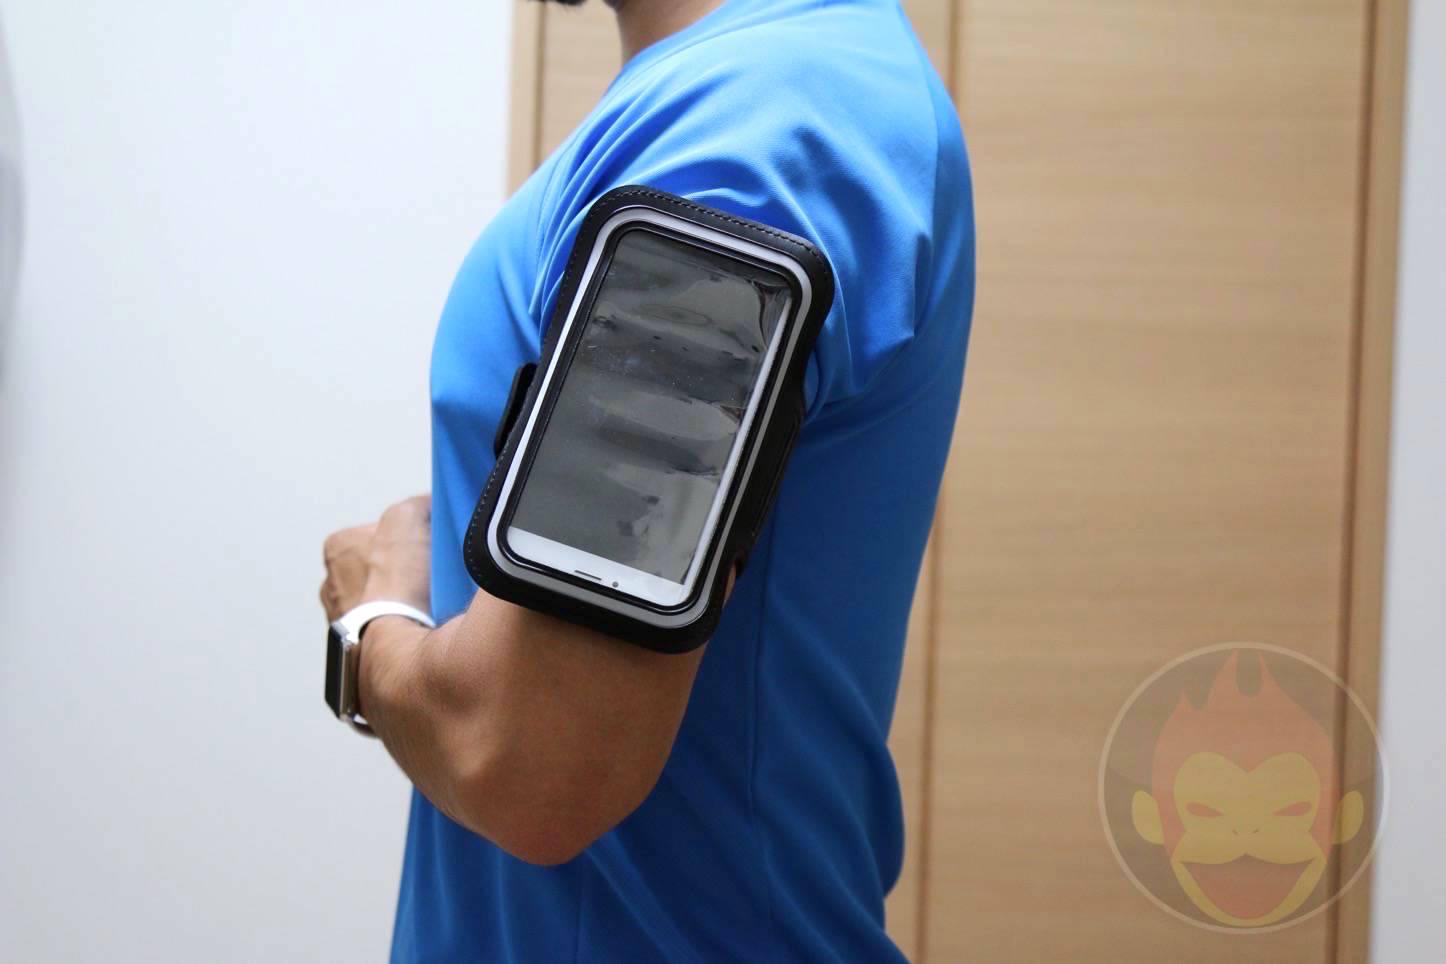 iPhone-6-Plus-Running-Arm-Band-19.JPG